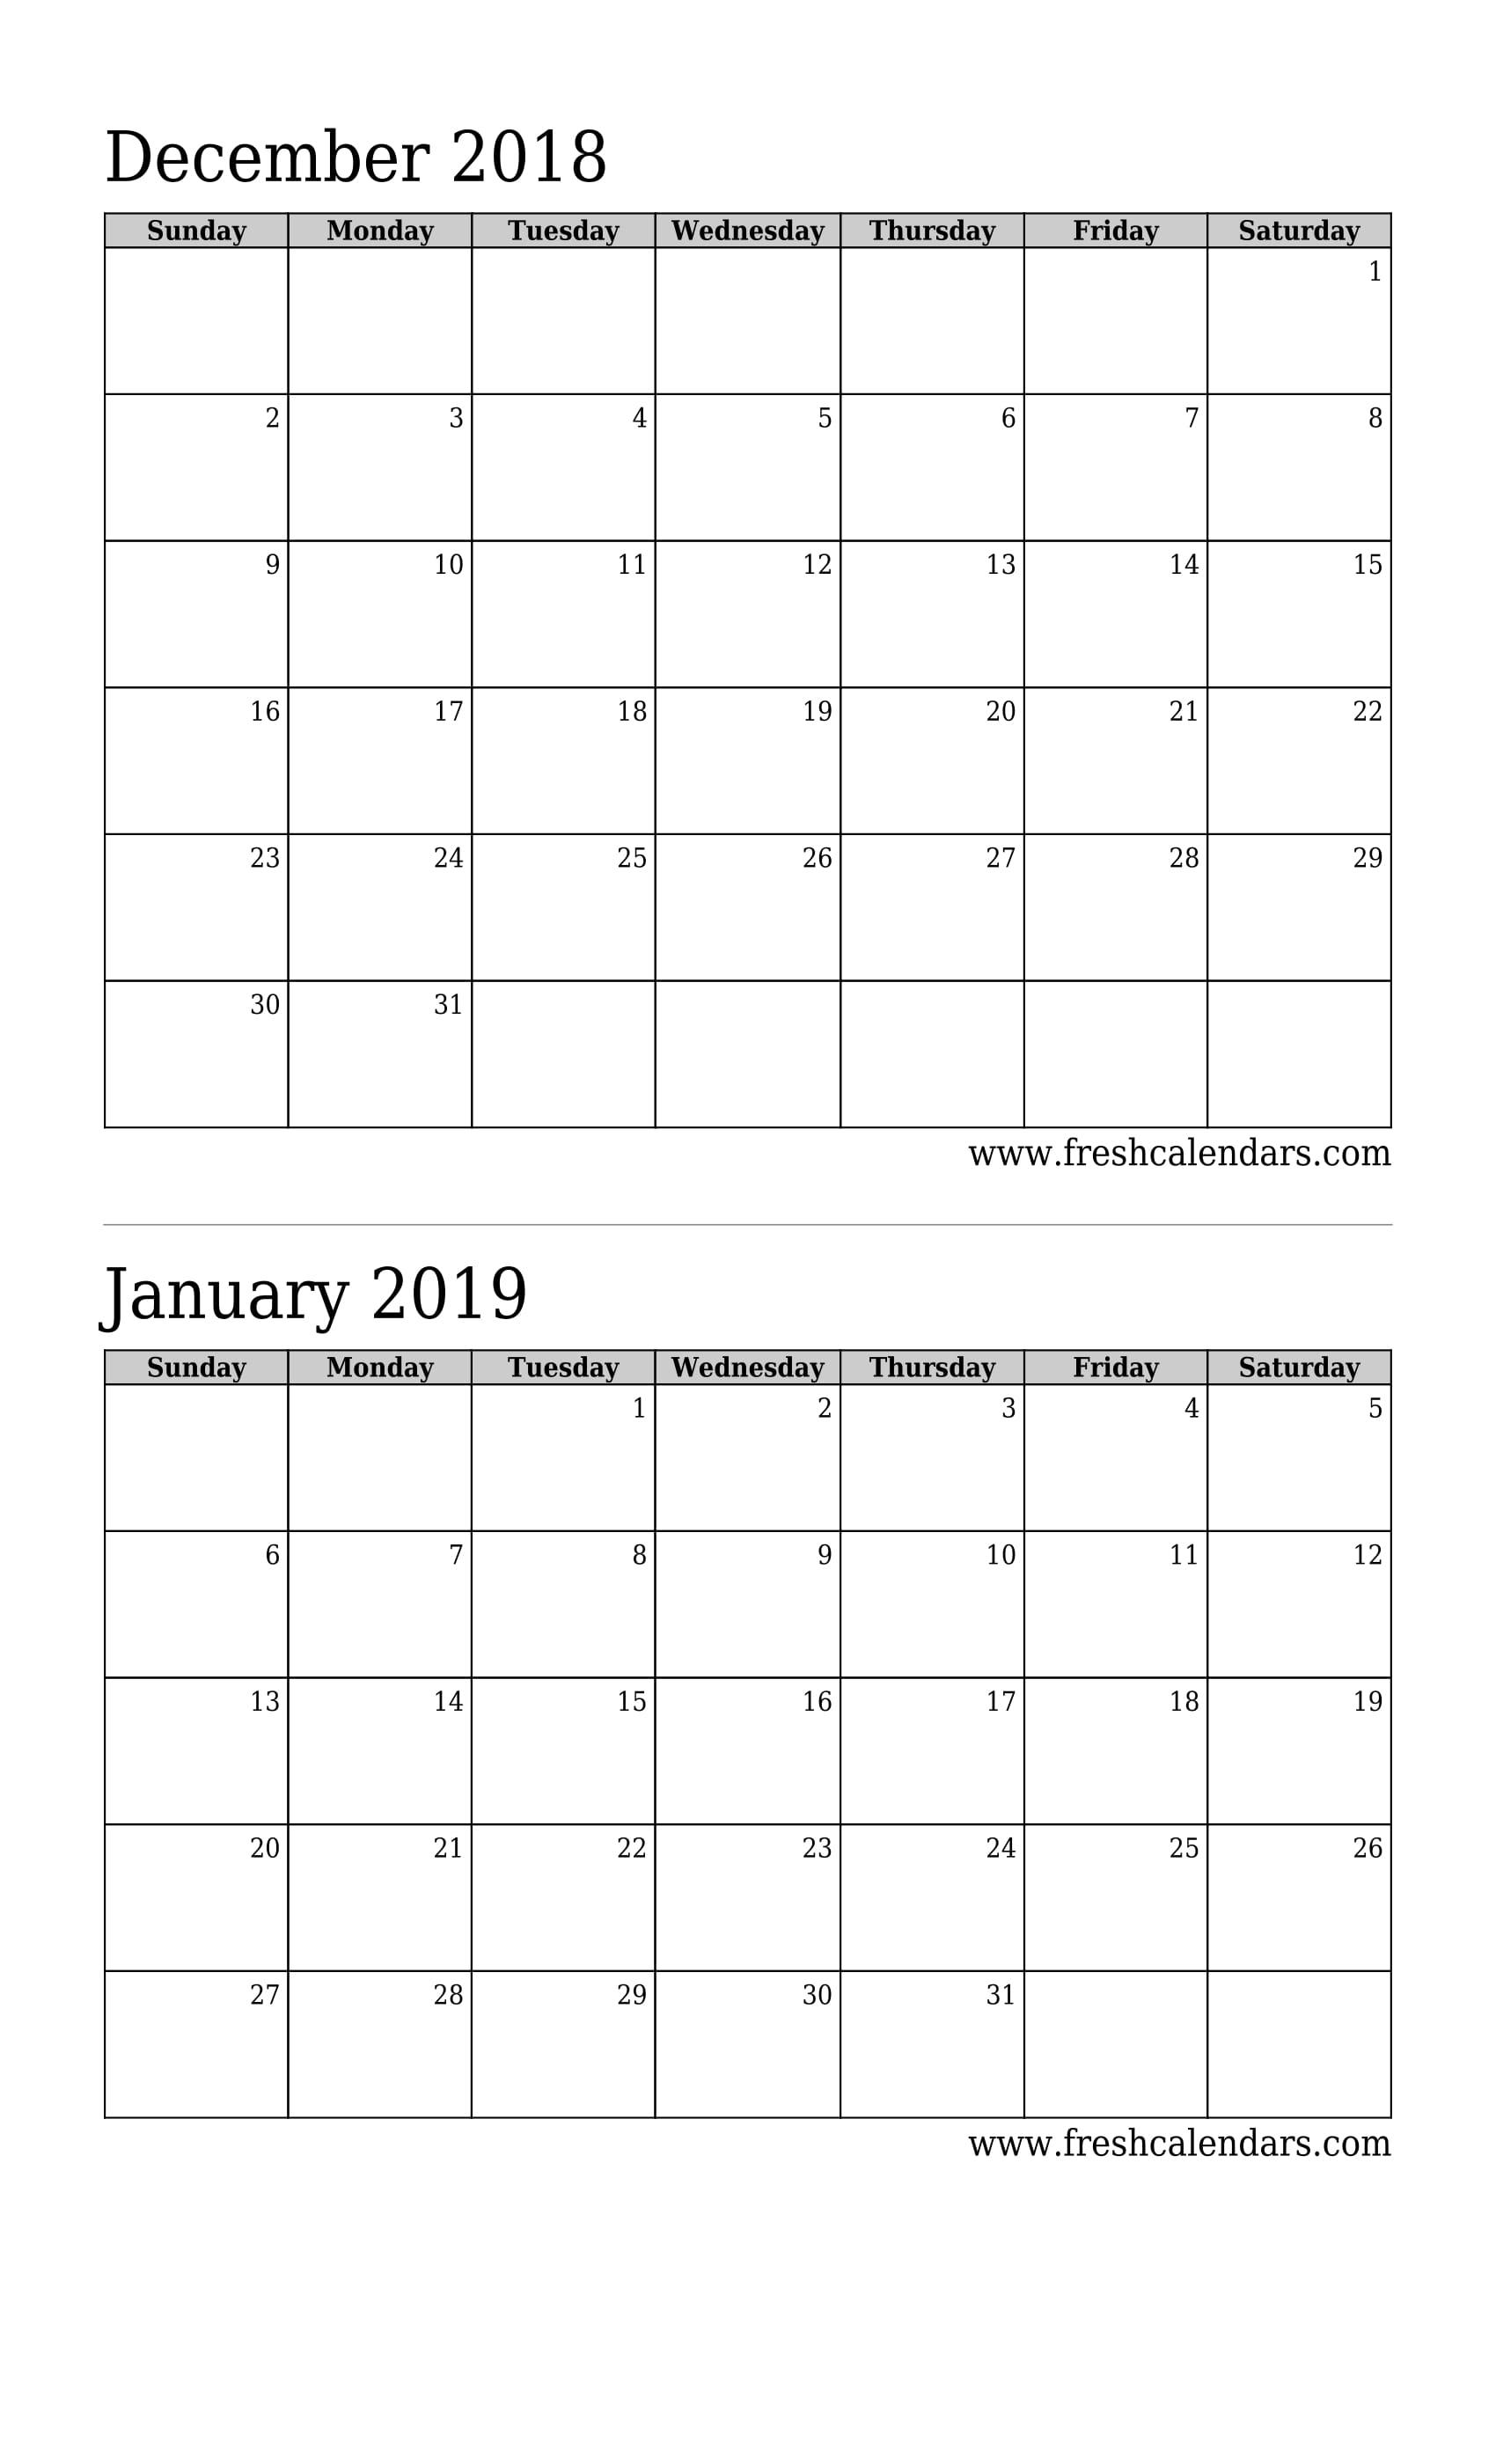 December 2018 Calendar Printable - Fresh Calendars throughout 2 Month Calendar Template June July